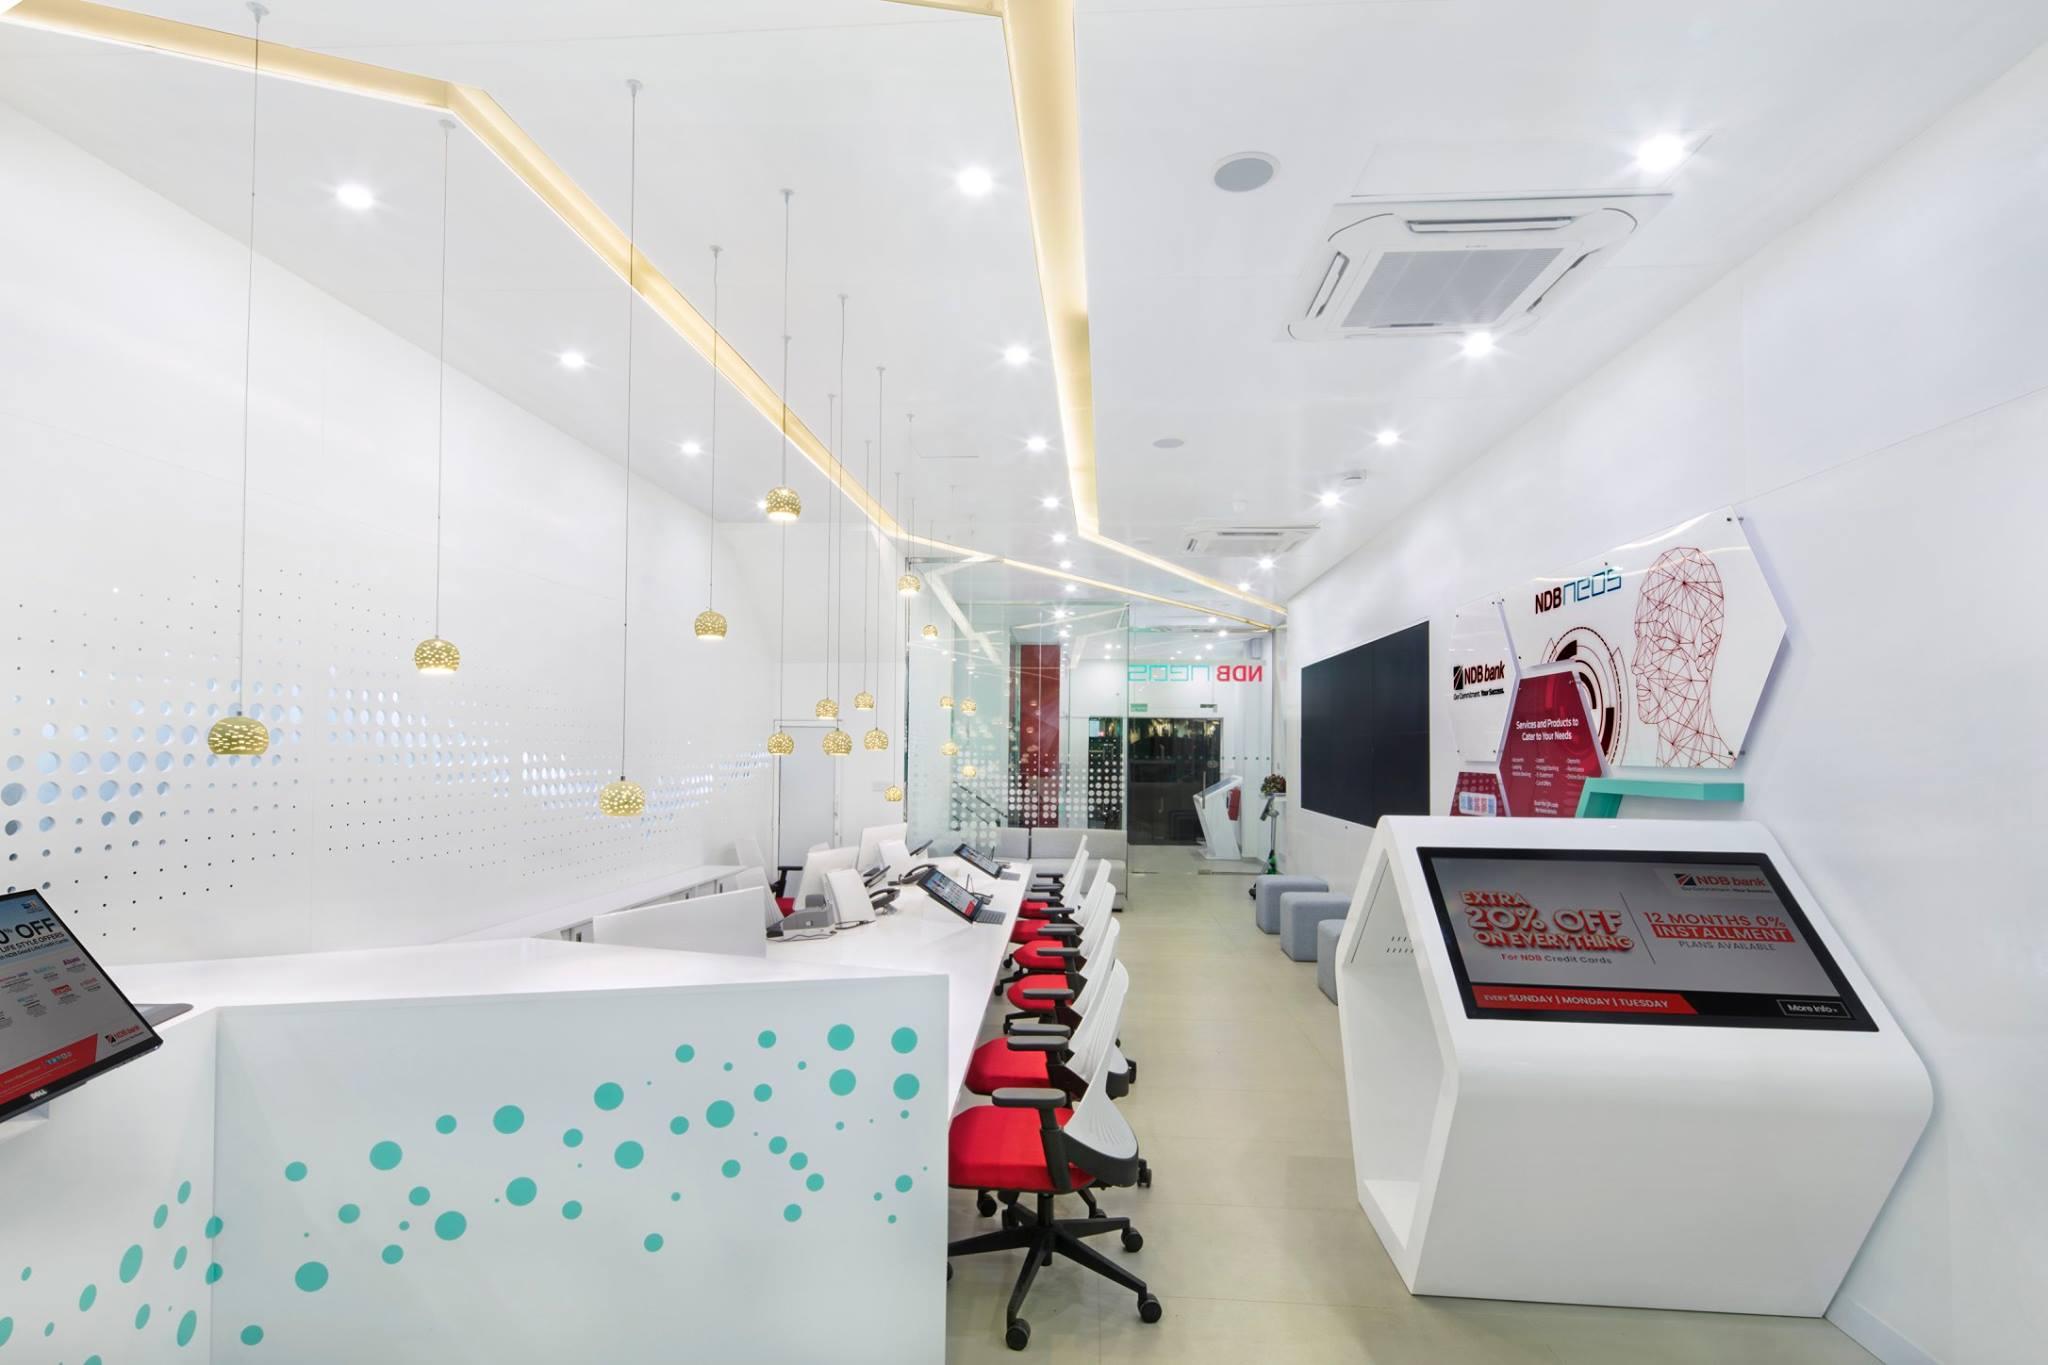 Arimac Digital NDB Bank Image 02| Bank Architecture and Design